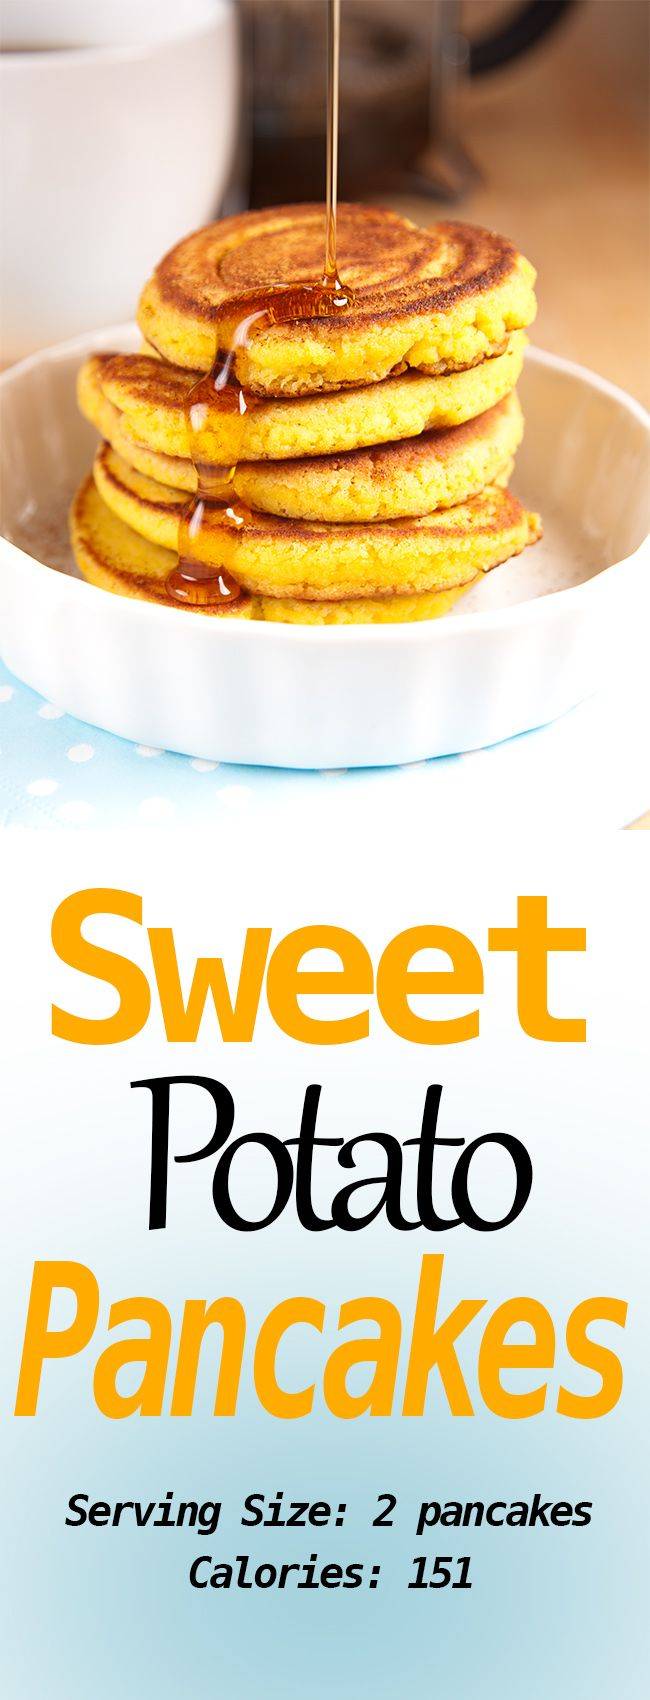 Diet Sweet Potato Pancakes – Secret Diet Tips